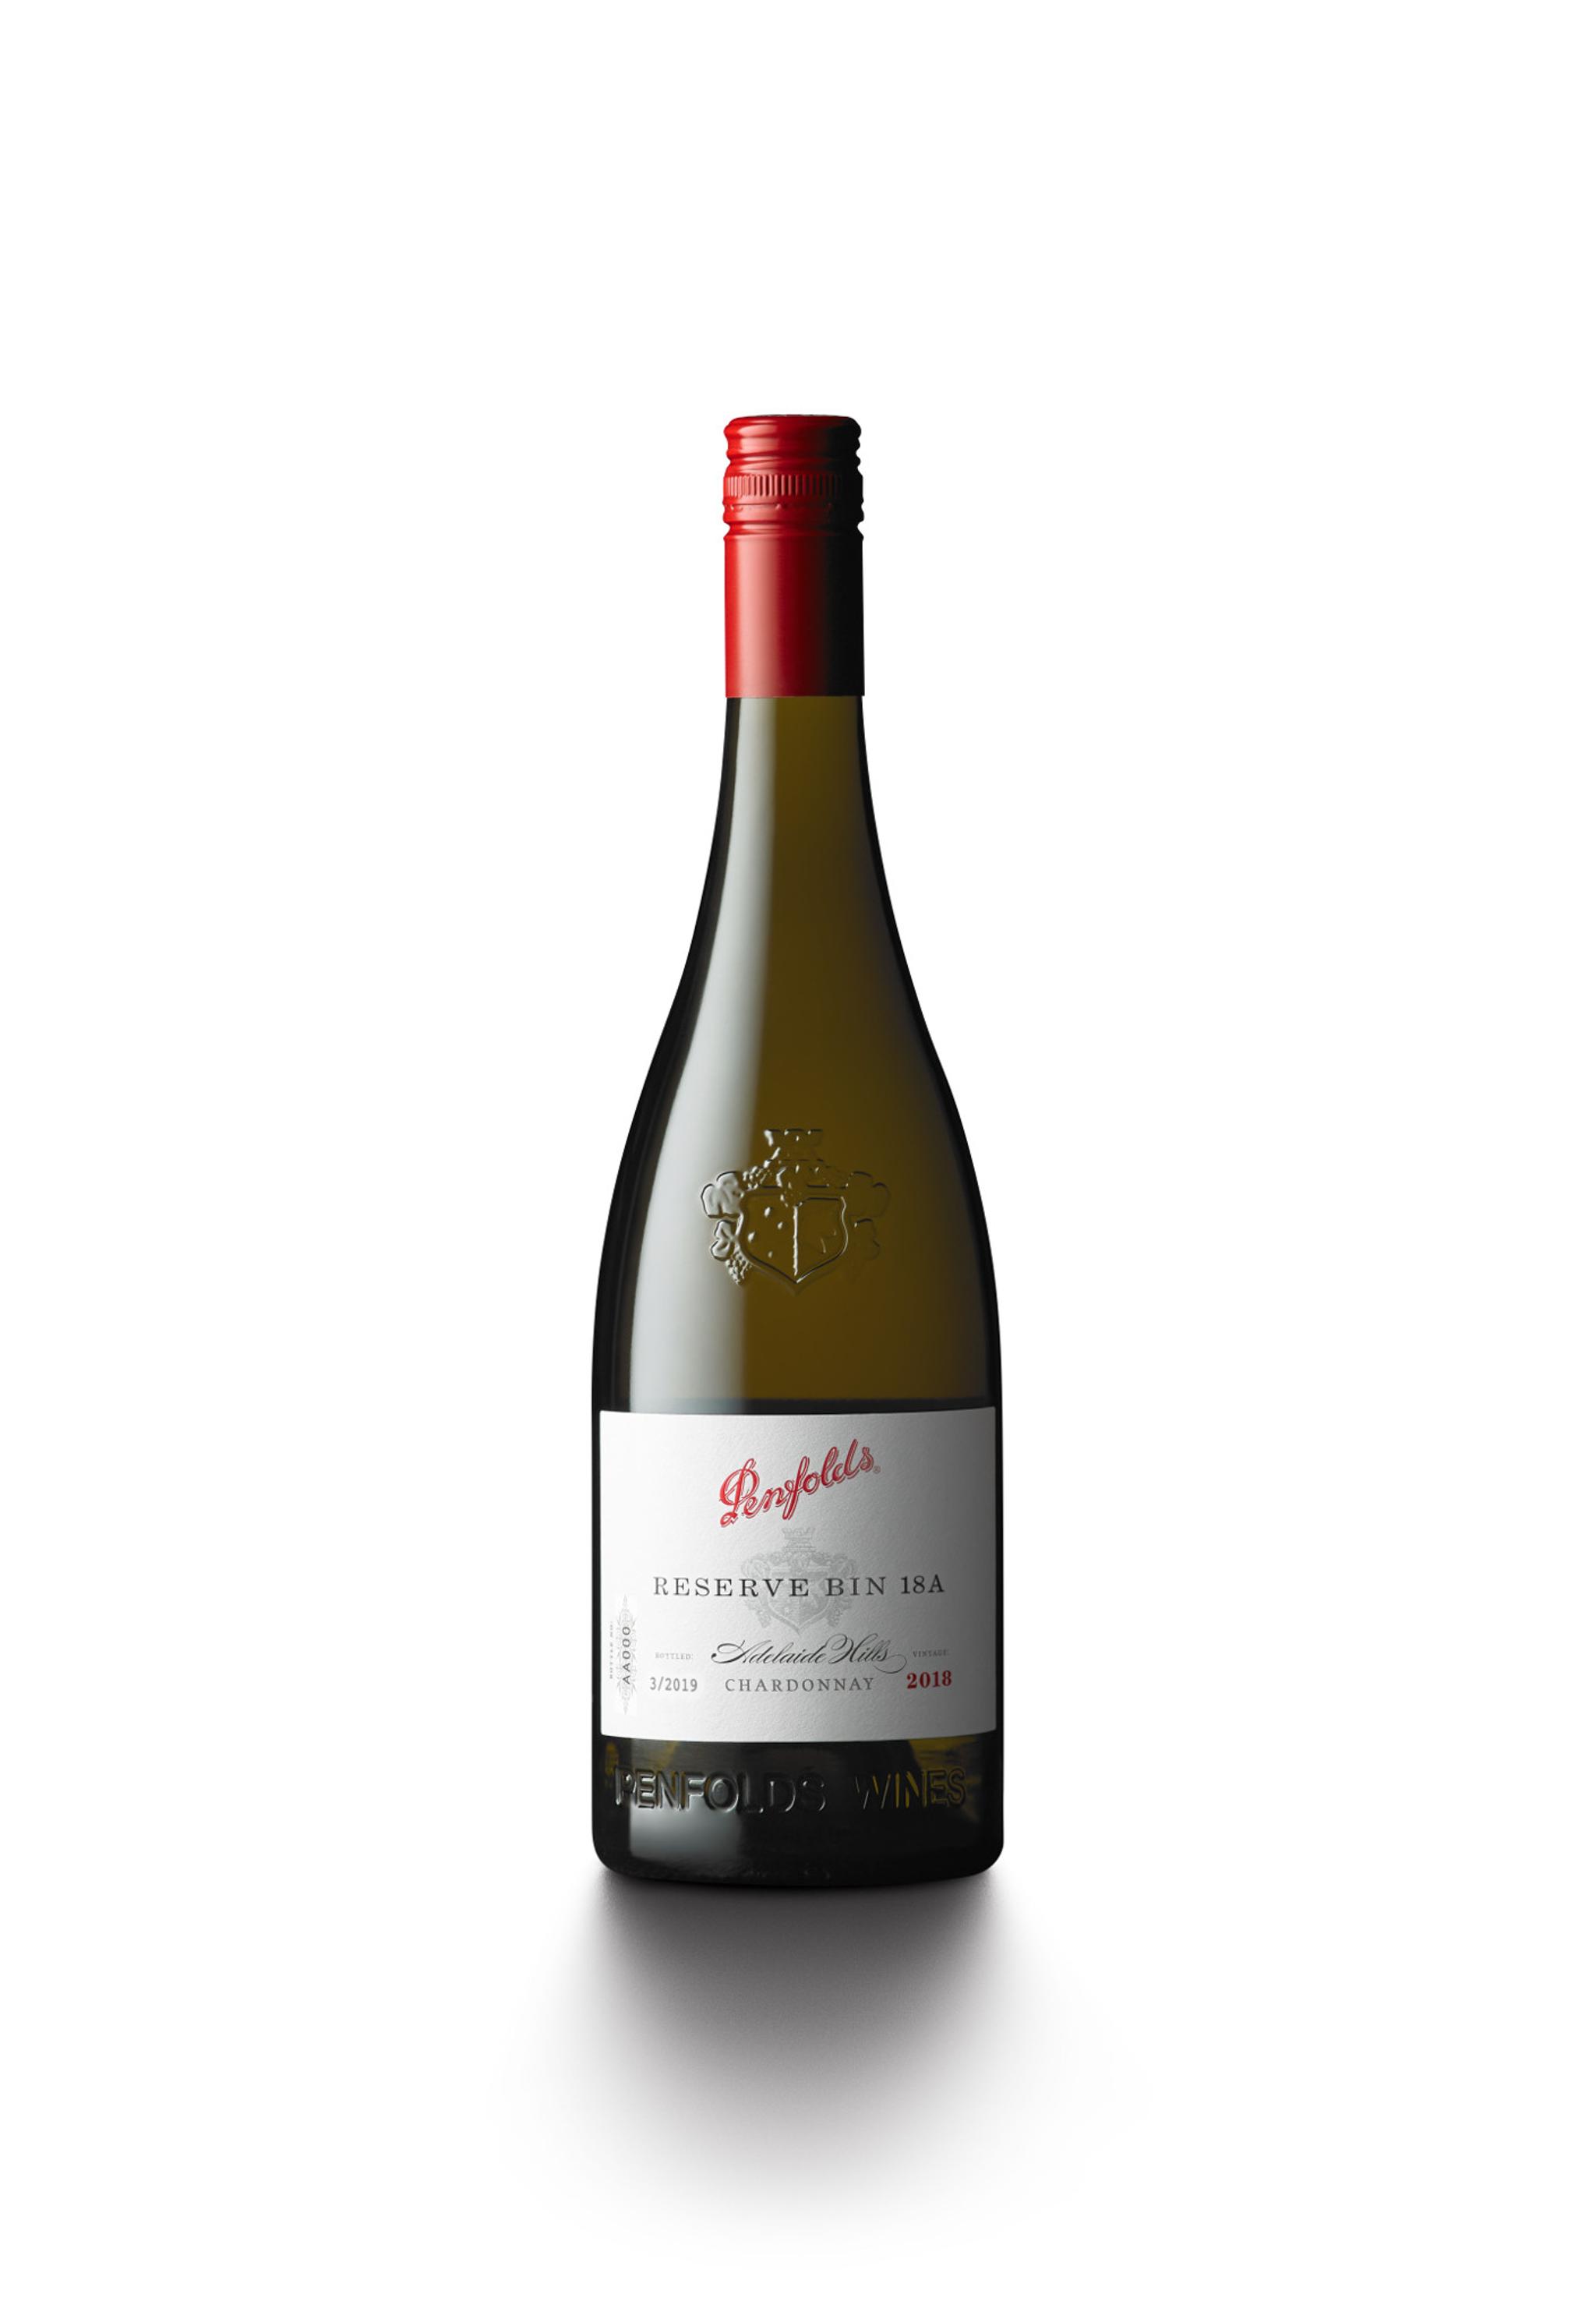 Reserve Bin 18A Adelaide Hills Chardonnay